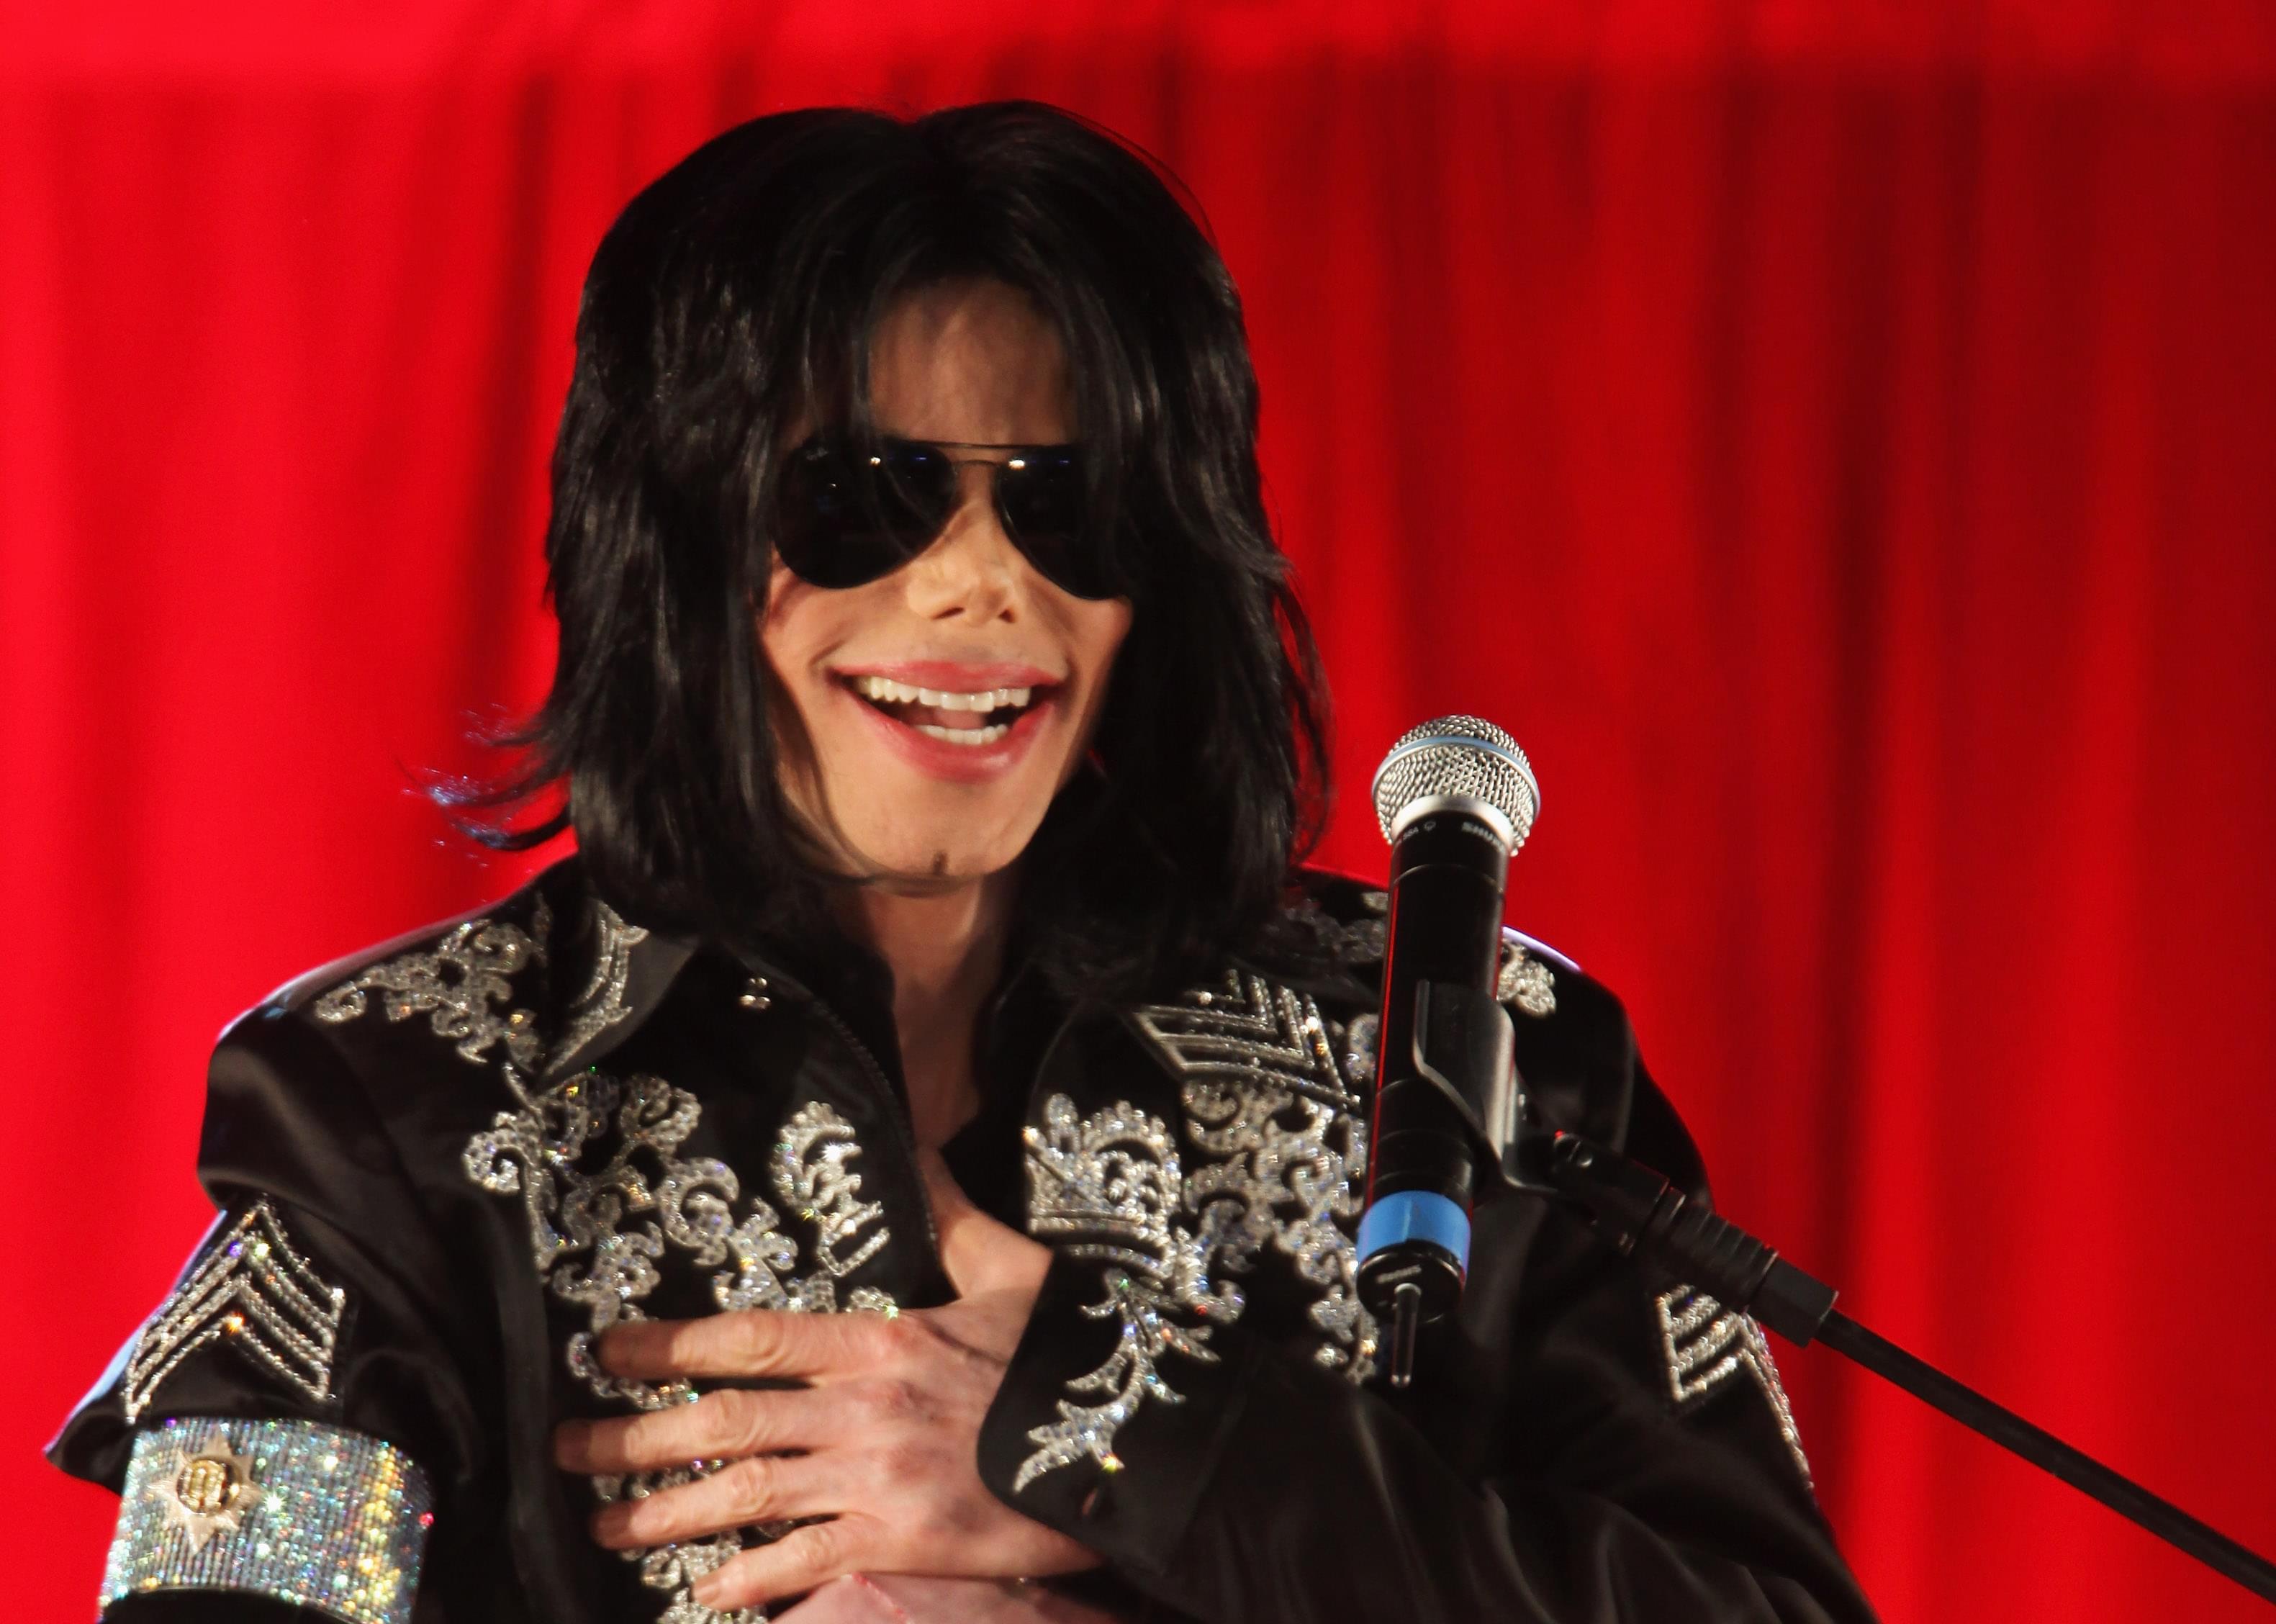 Michael Jackson's Original Moonwalk Slippers Set At $10k Auction Price